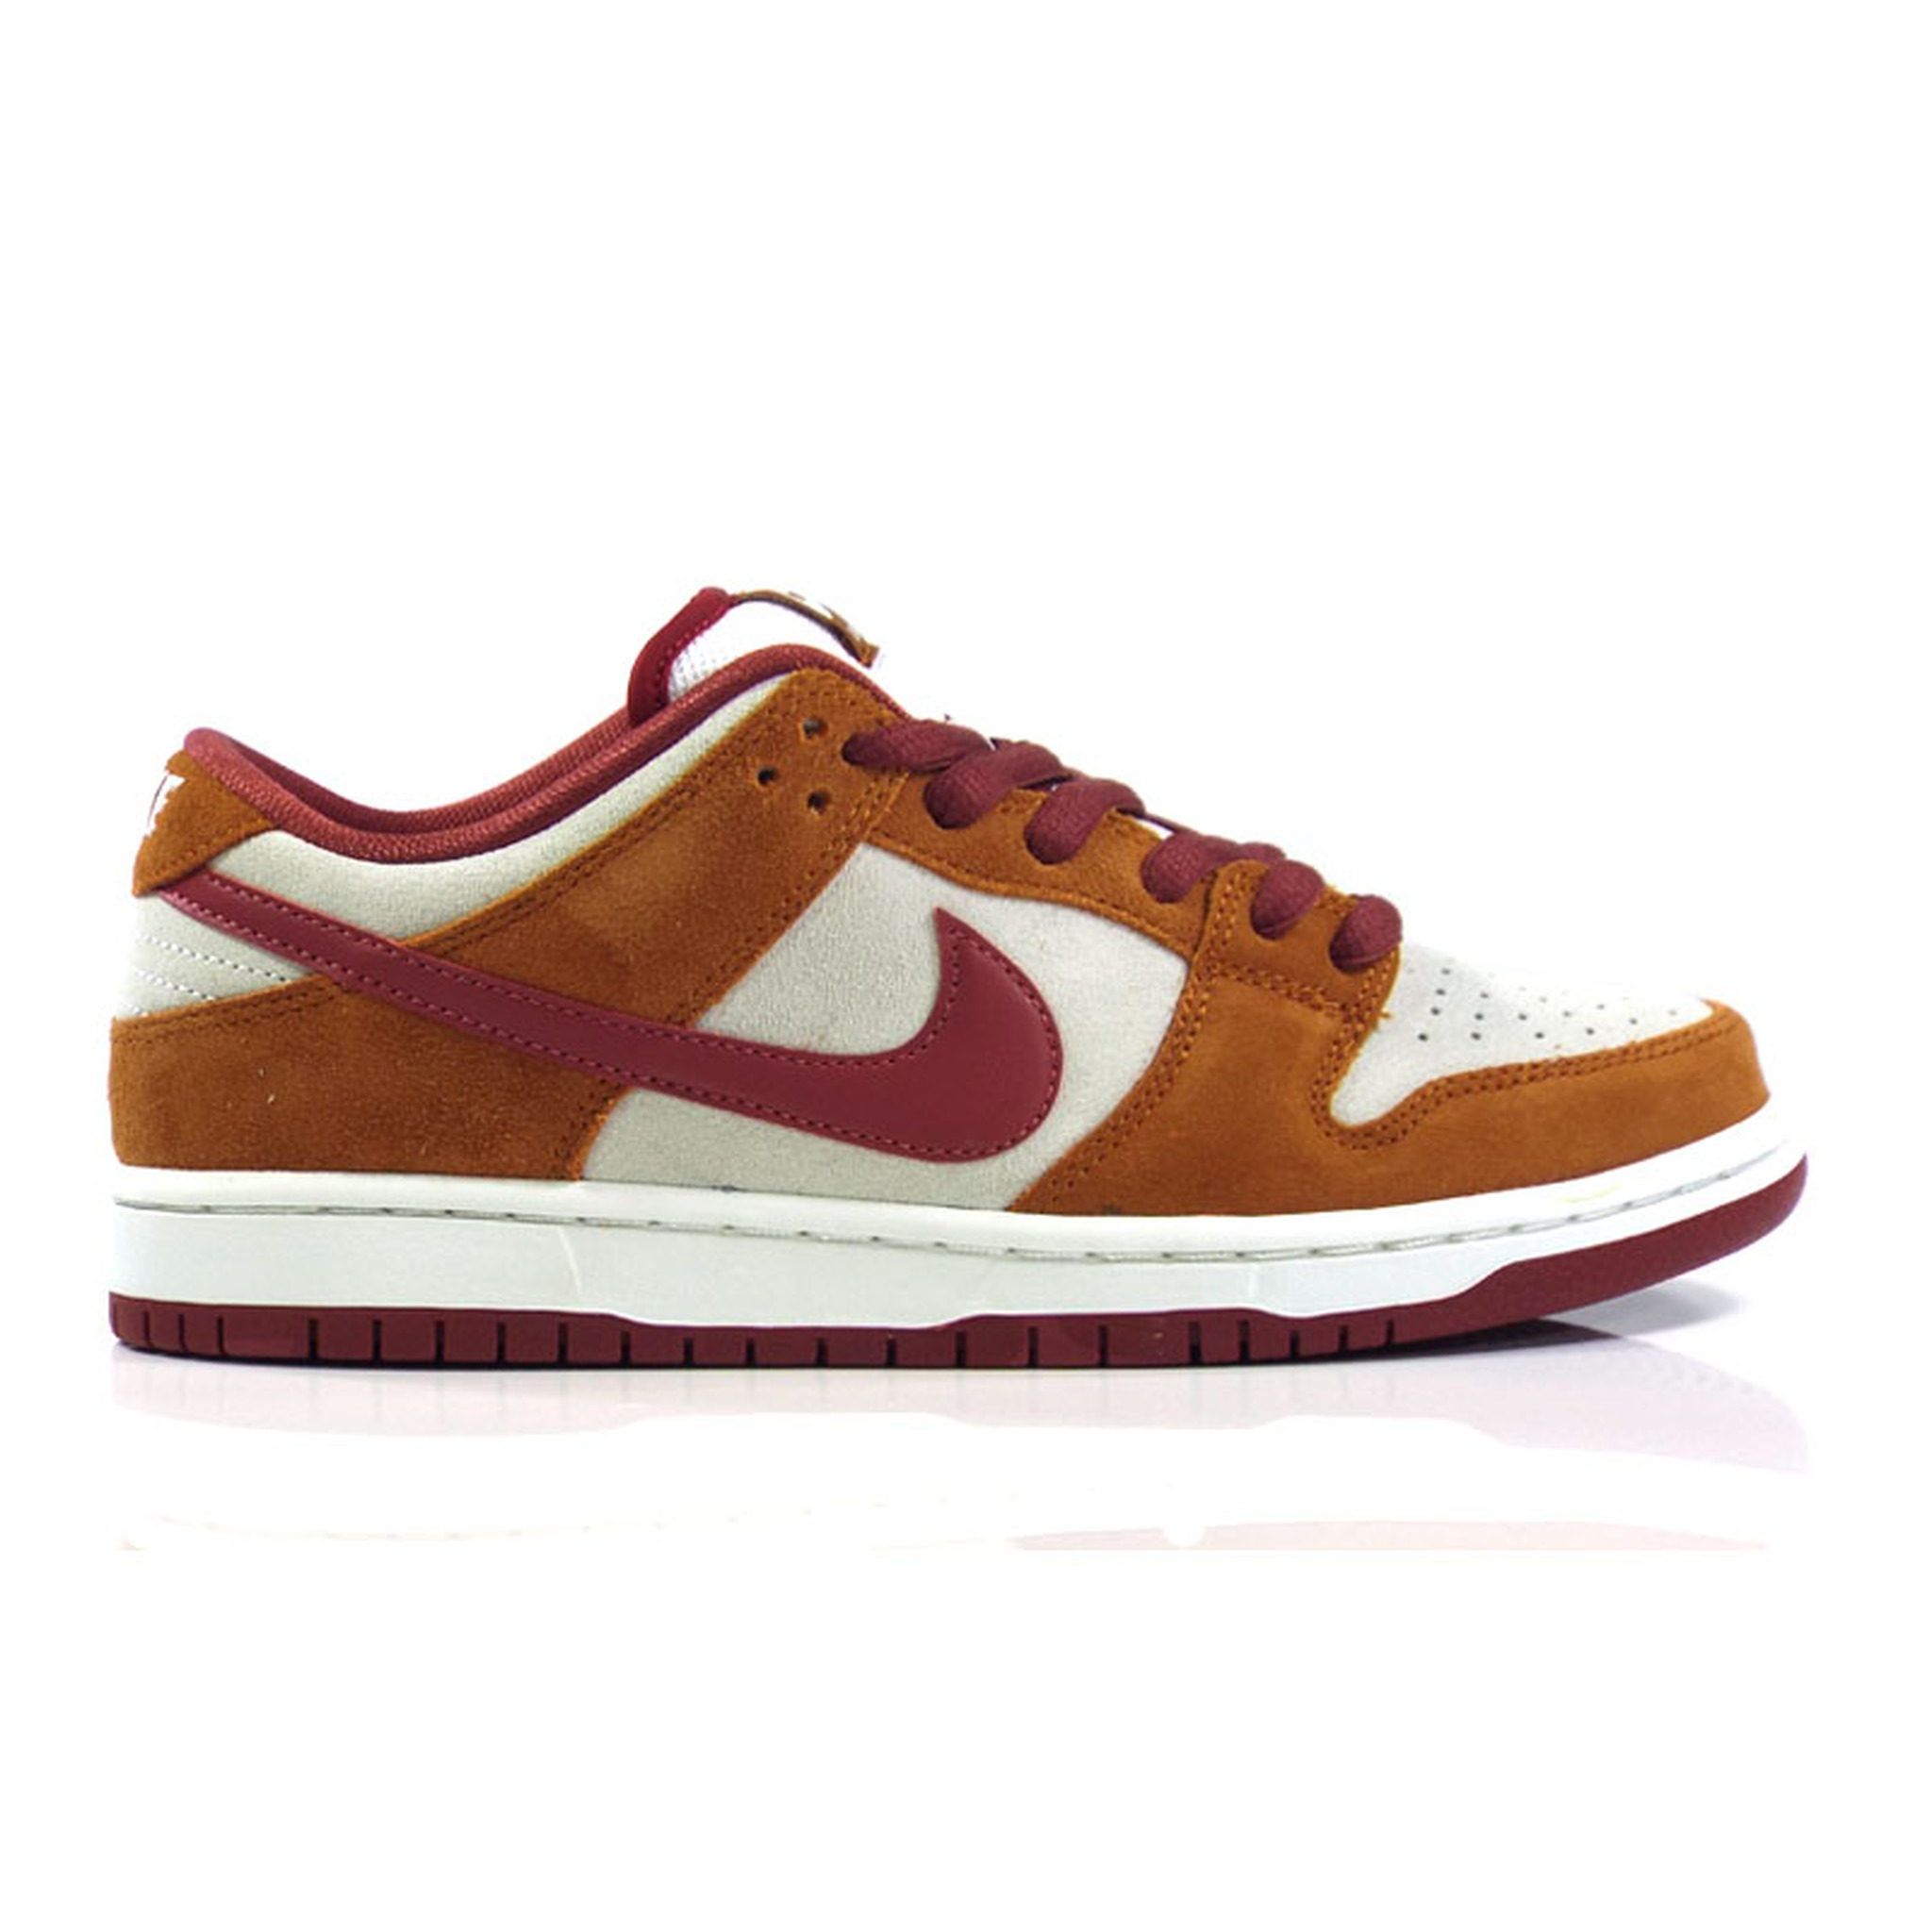 huge discount aaedc a1f81 Nike SB Zoom Dunk Low Pro Shoes - Dark Russet/Cedar-Summit White